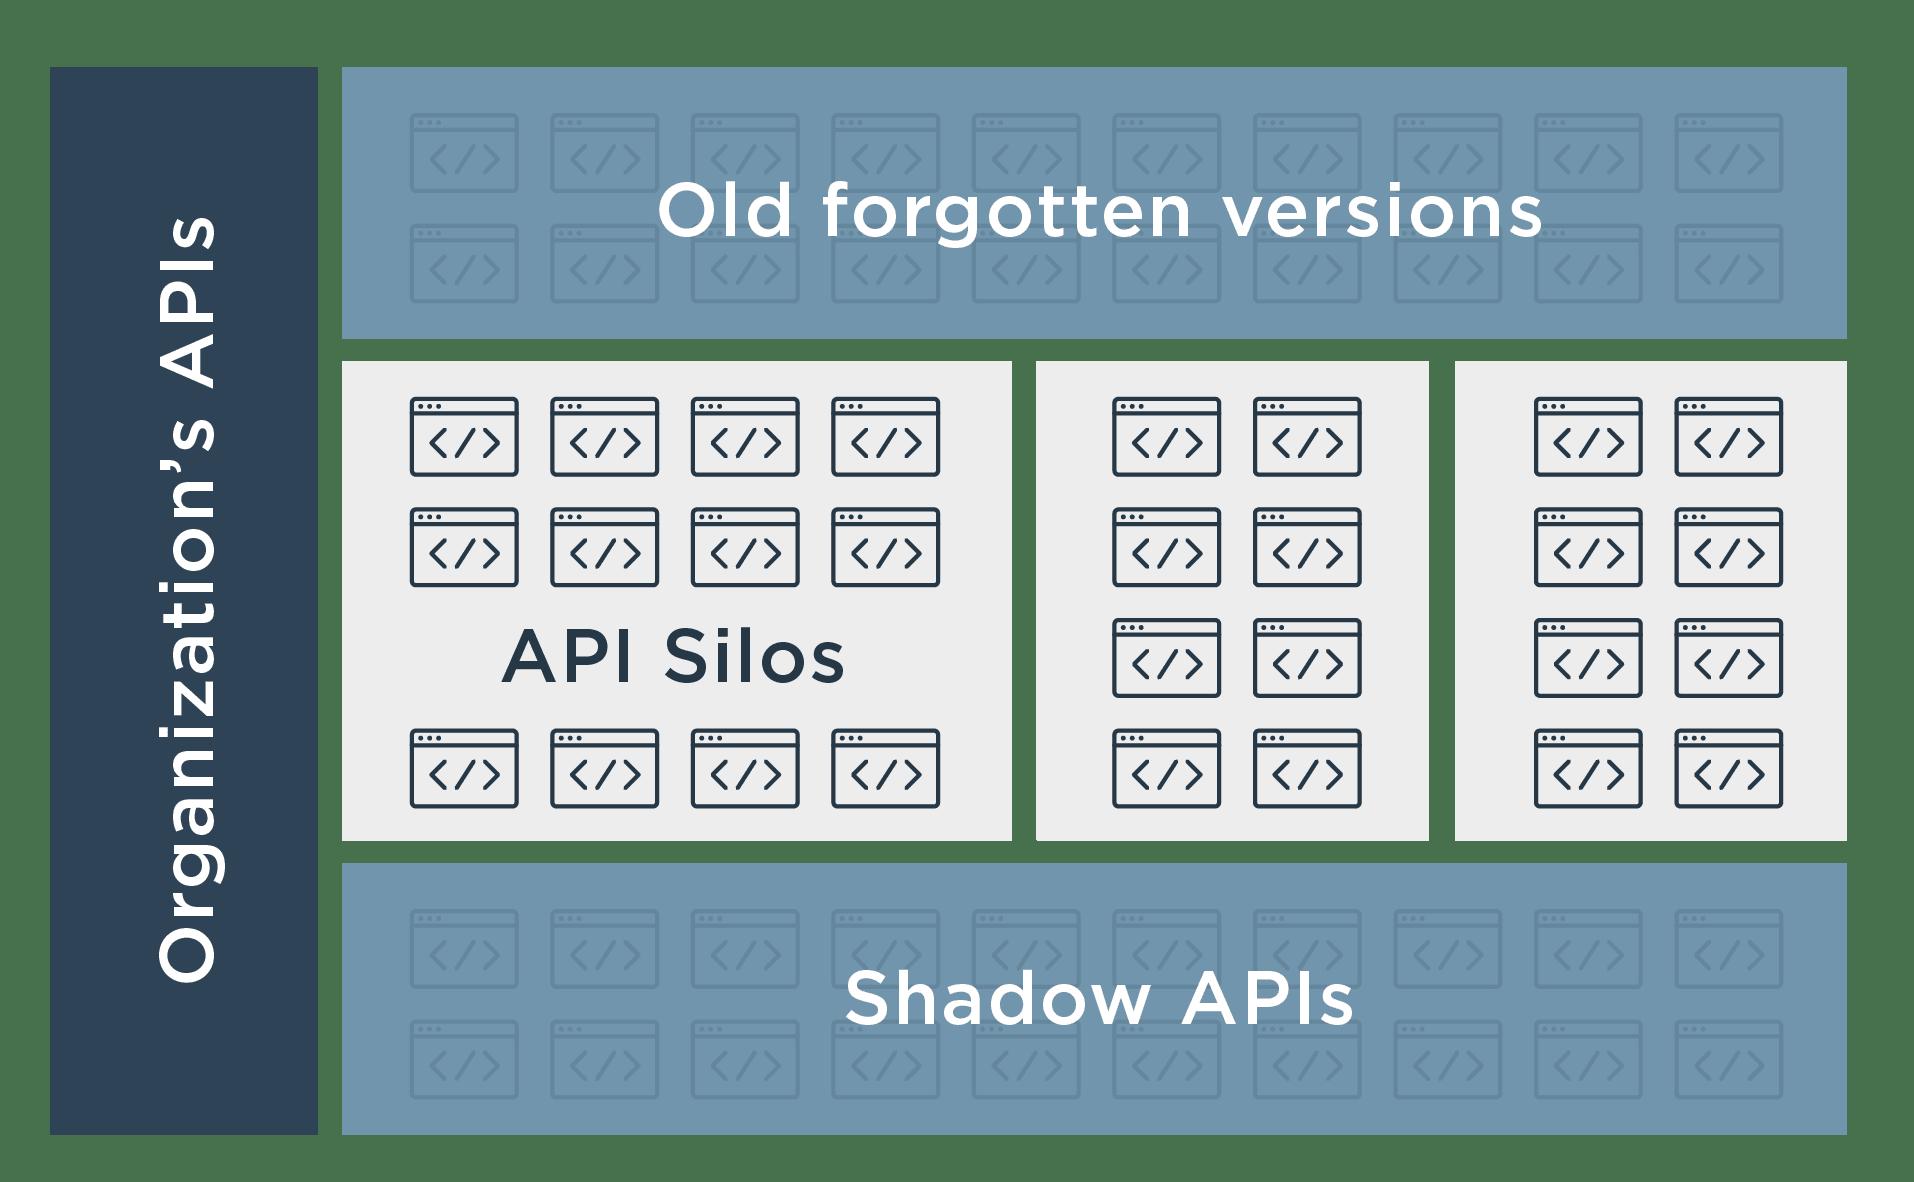 Shadow APIs